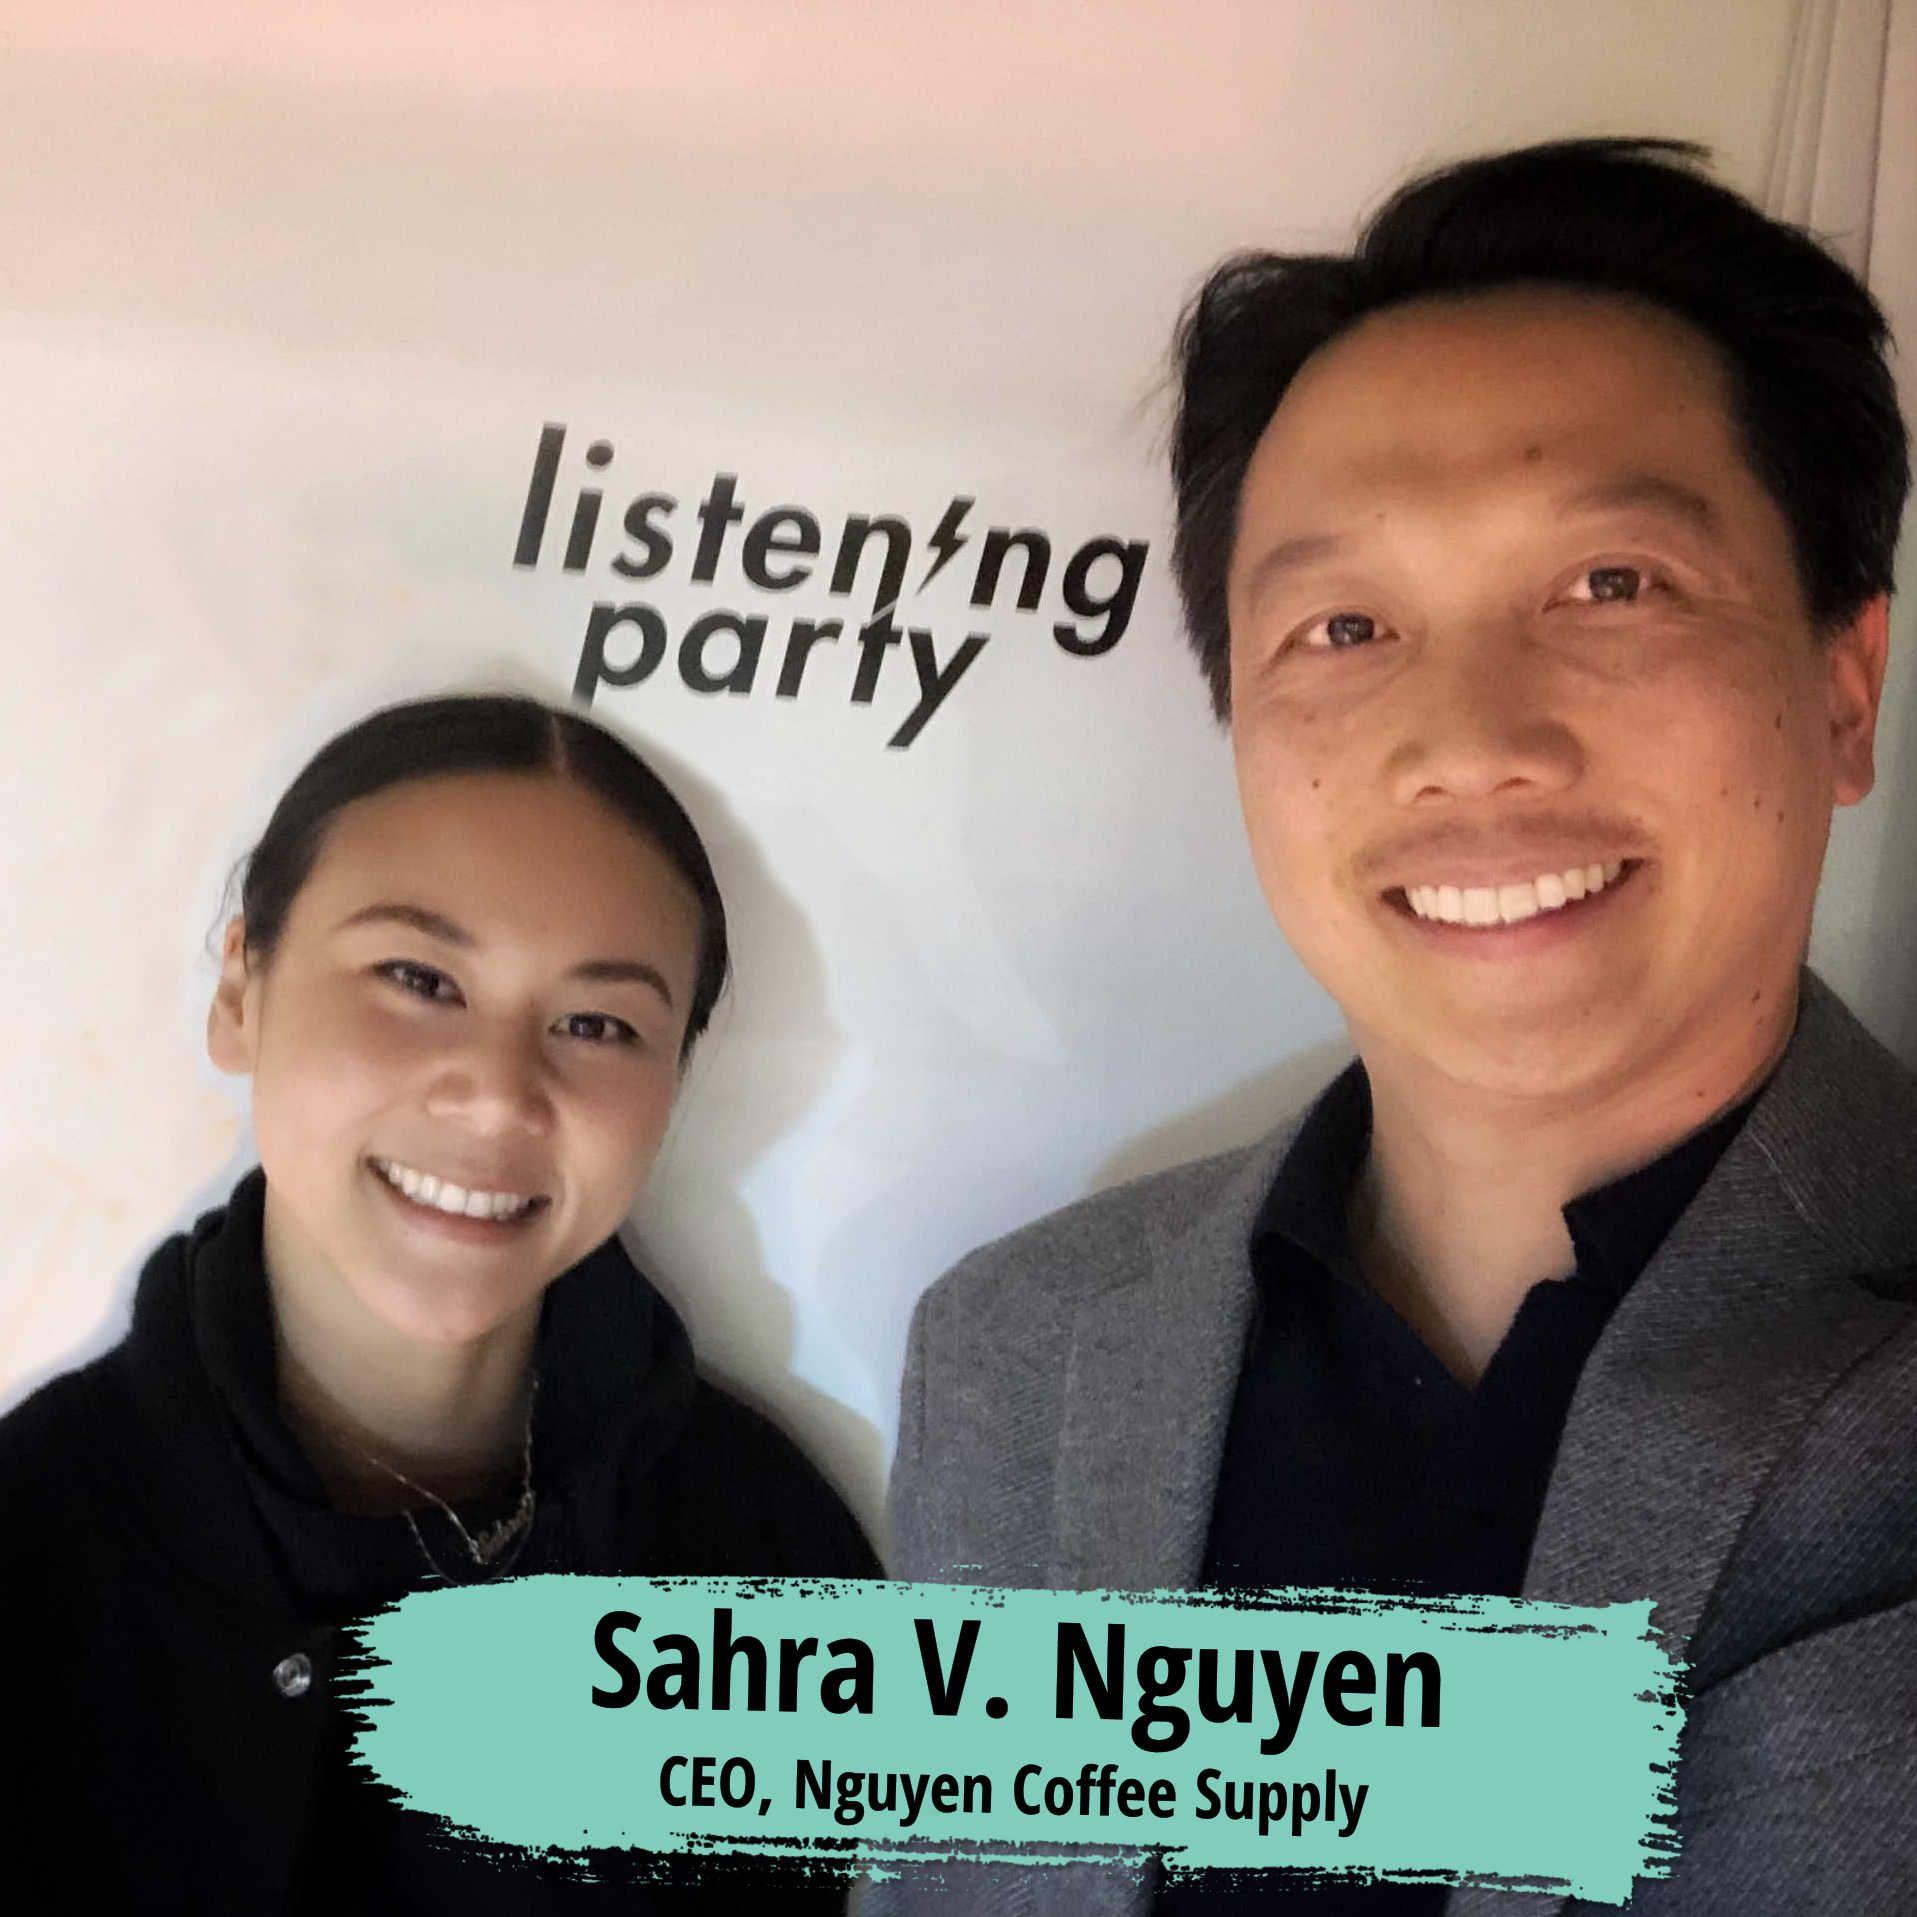 Sahra V. Nguyen